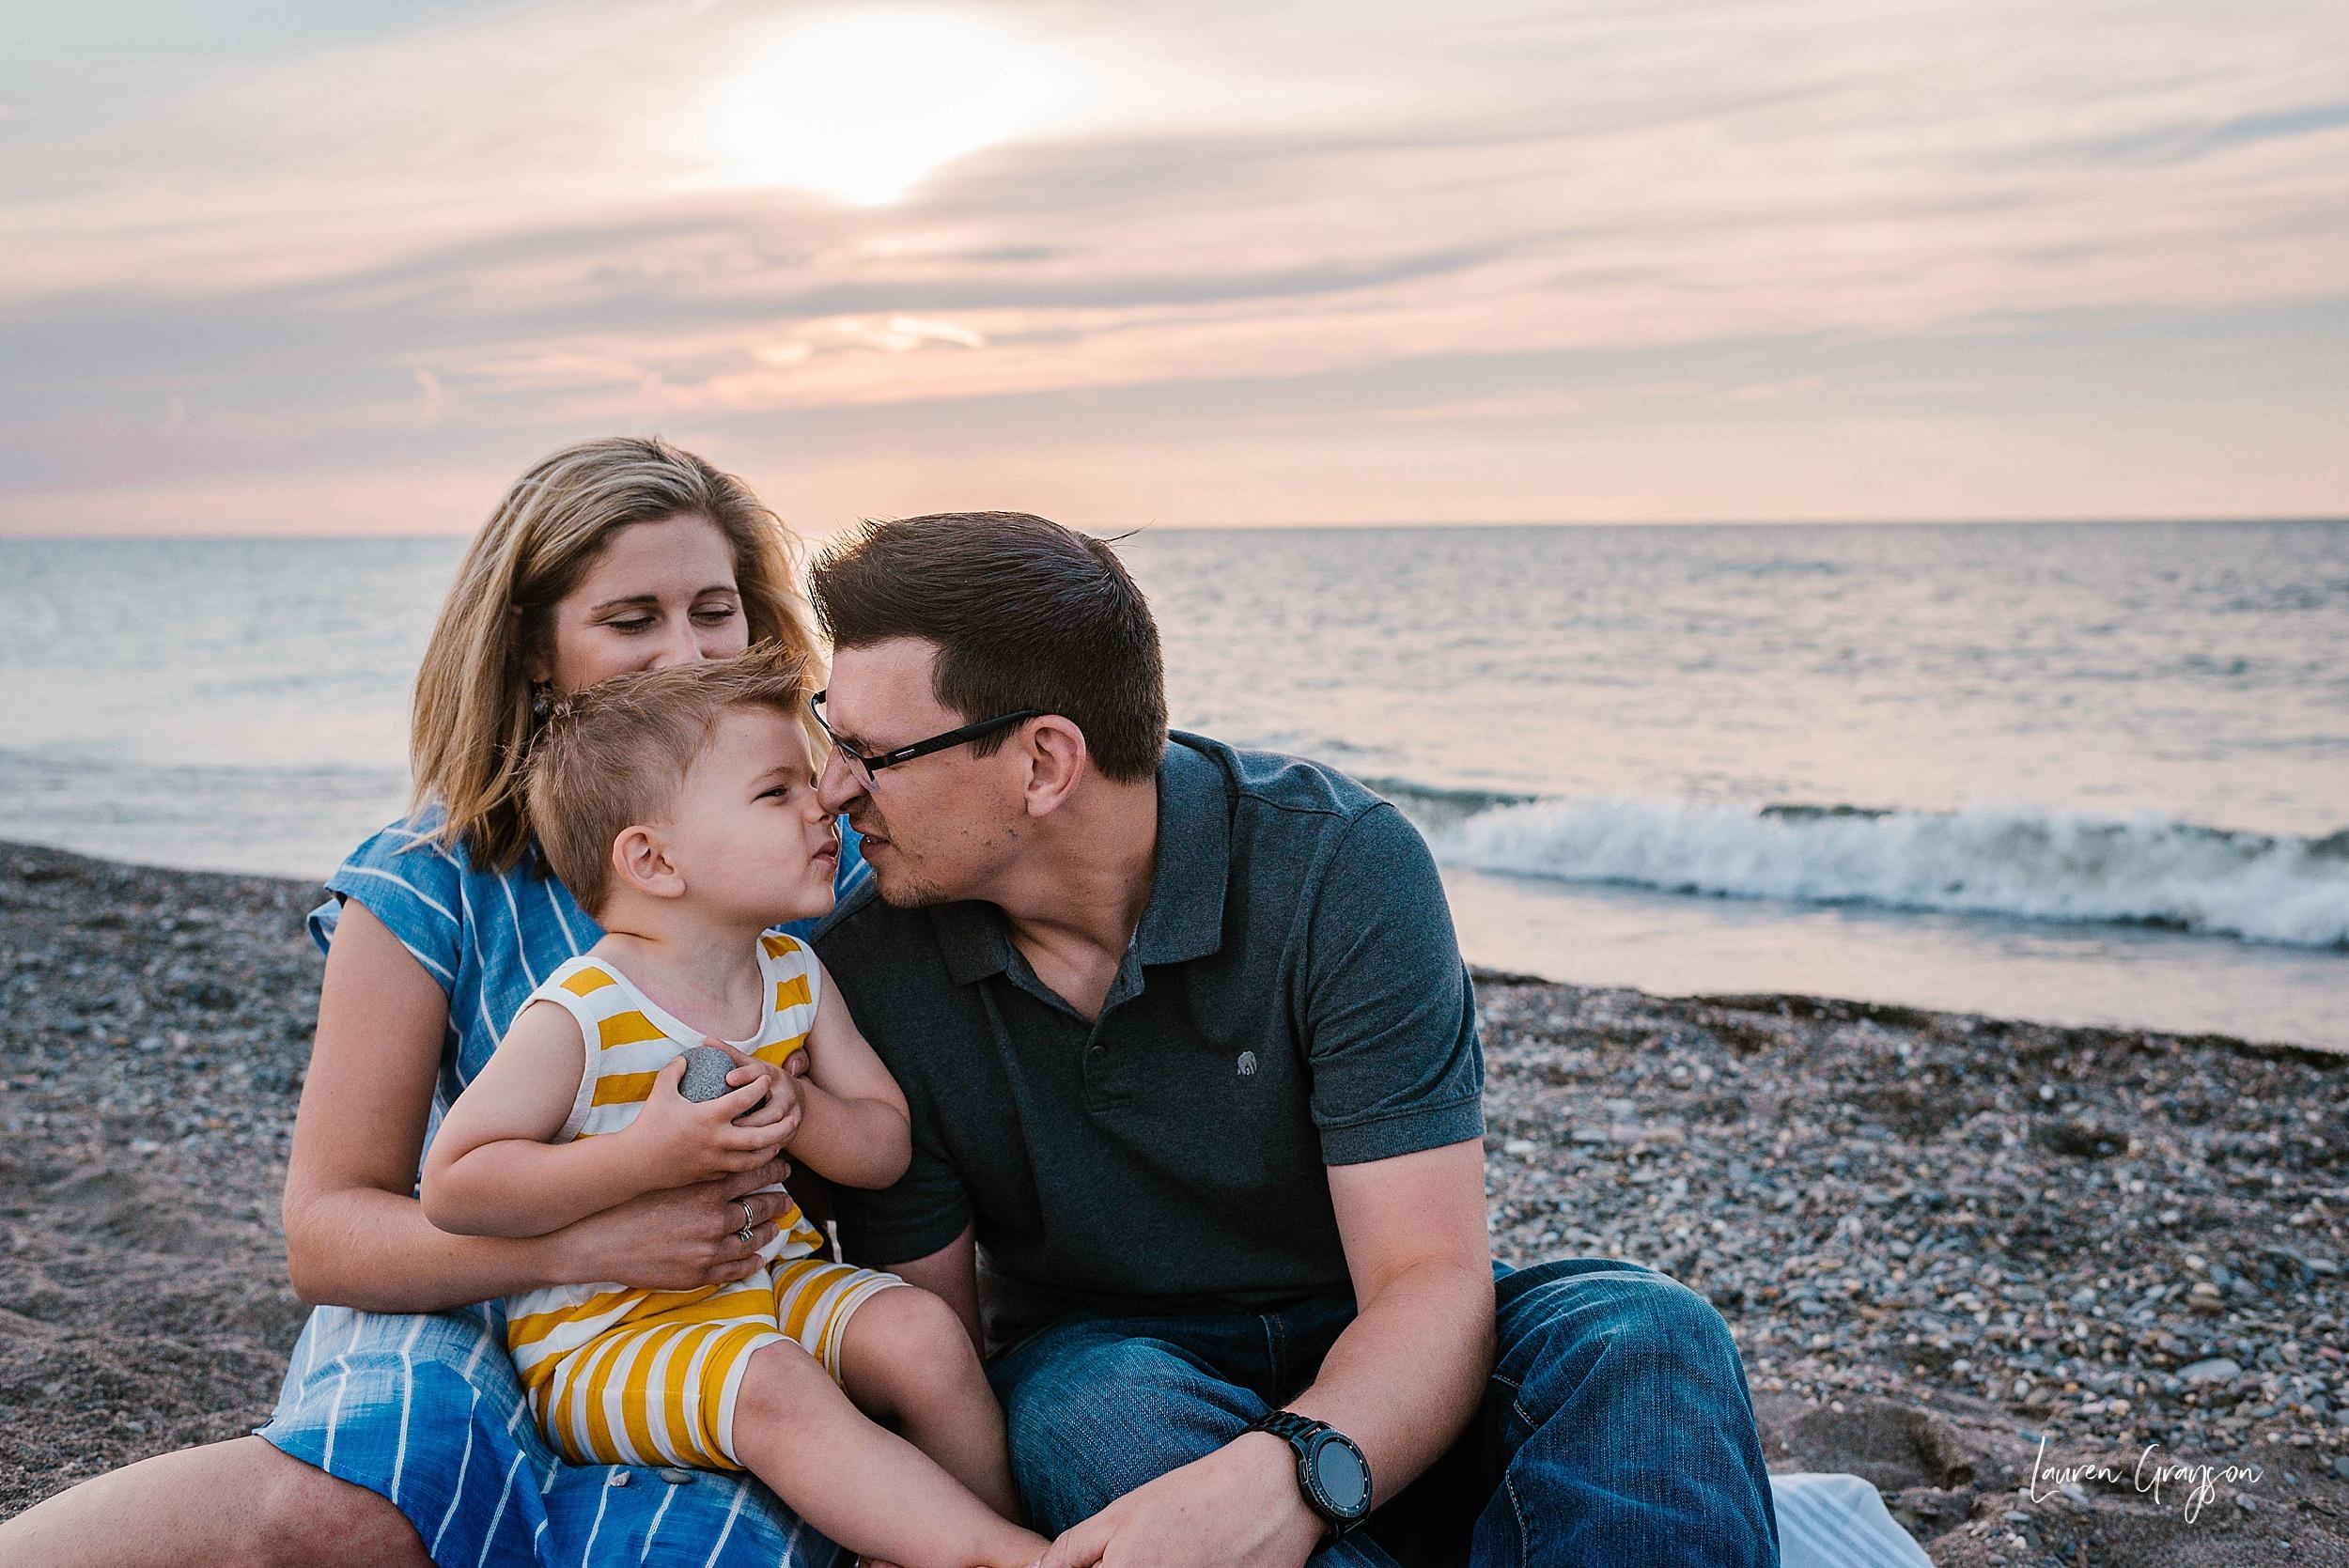 lauren-grayson-photography-cleveland-ohio-photographer-mentor-headlands-beach-maternity-session-2018_0772.jpg